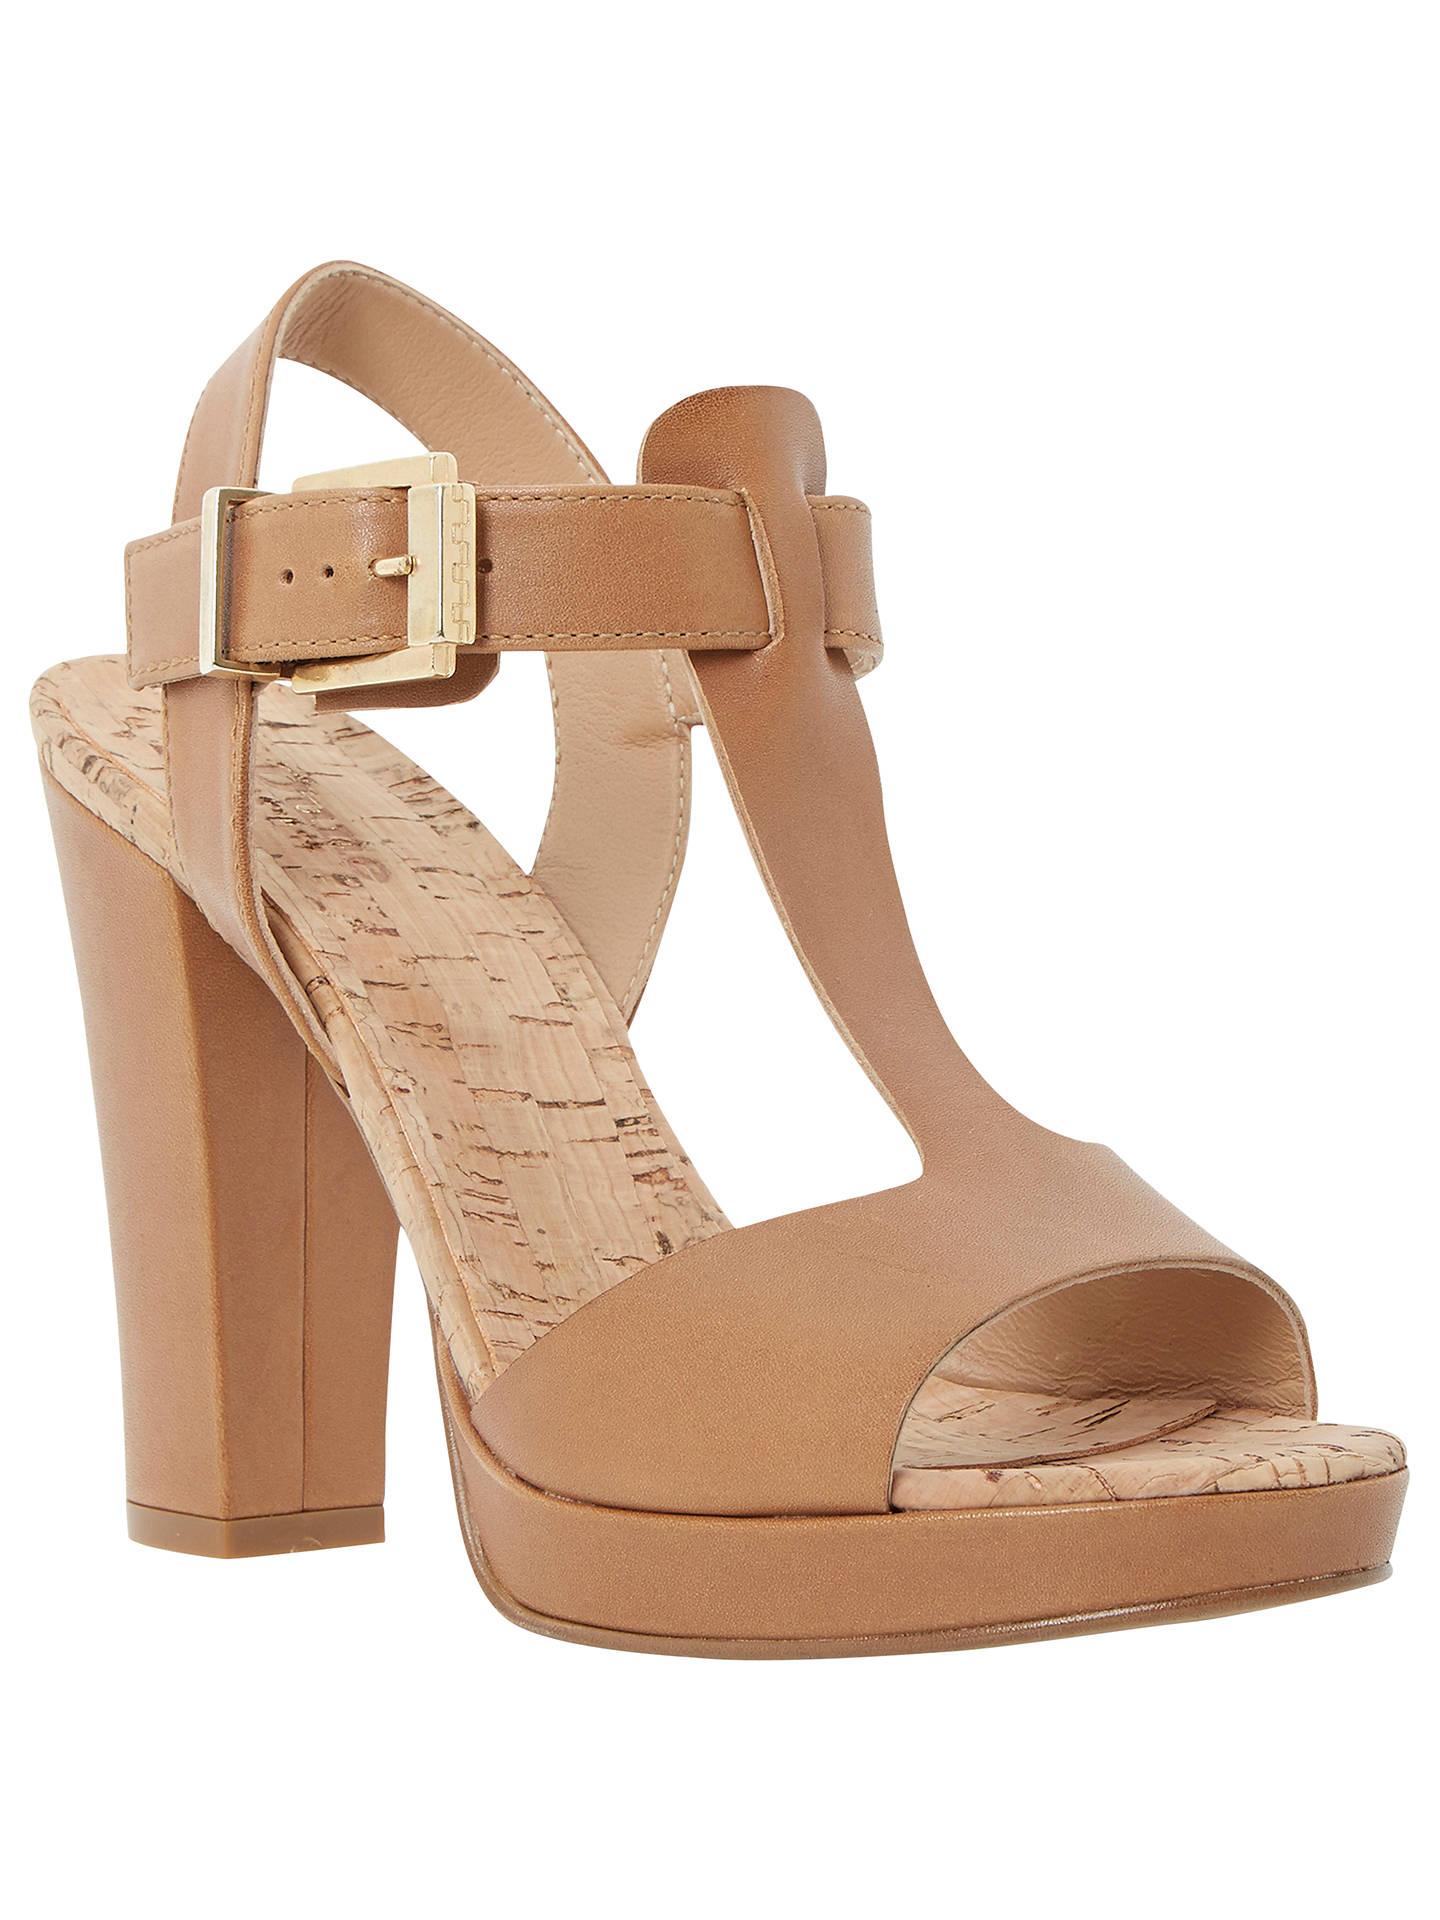 Dune Jasmin Leather T-Bar Block Heel Sandals at John Lewis   Partners